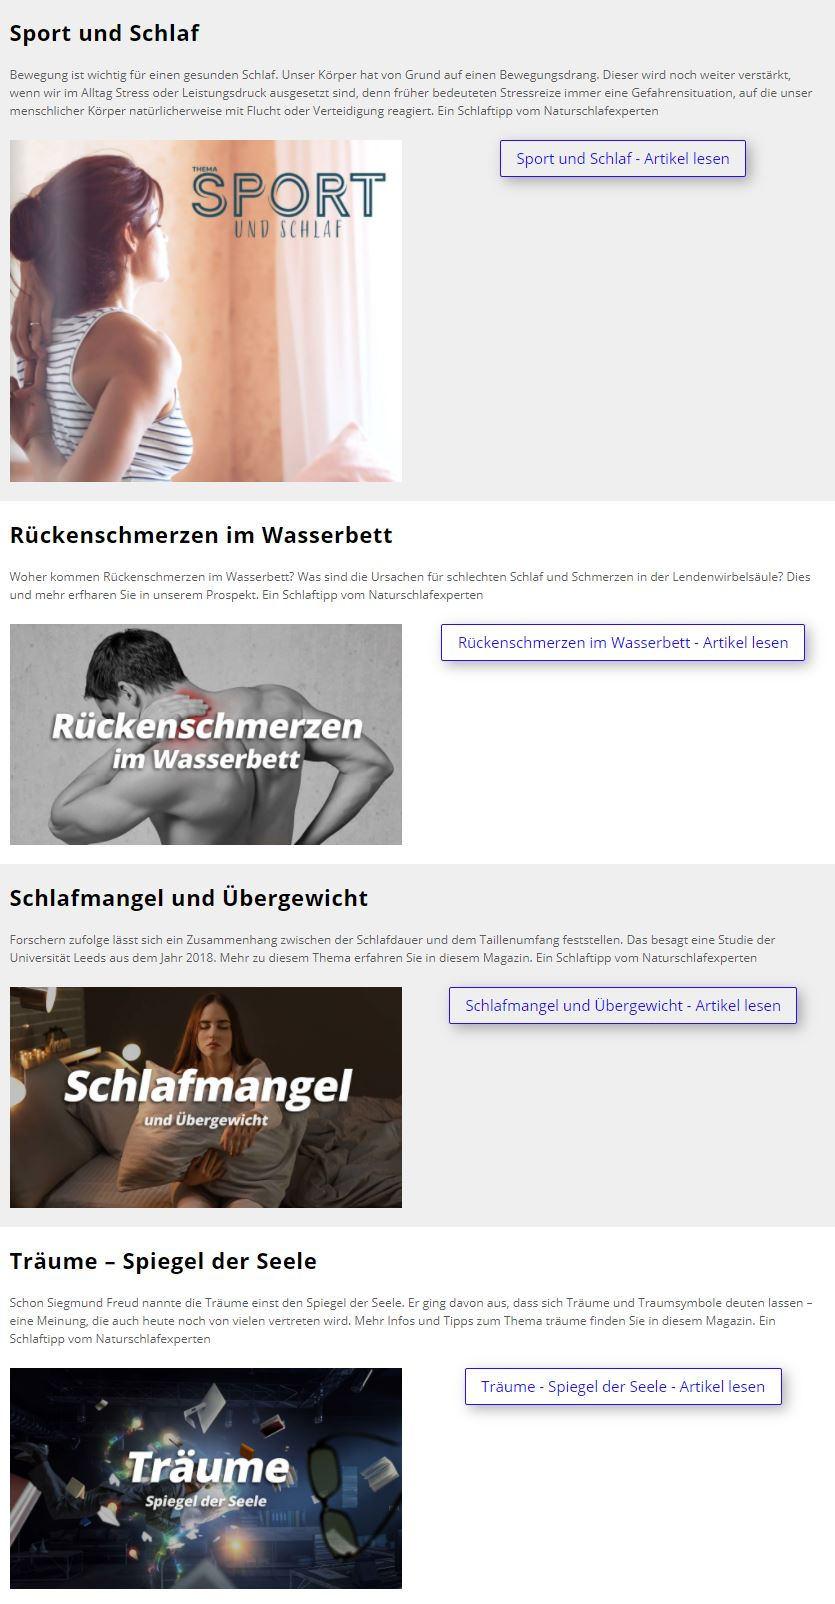 niebler-schlafratgeber-02